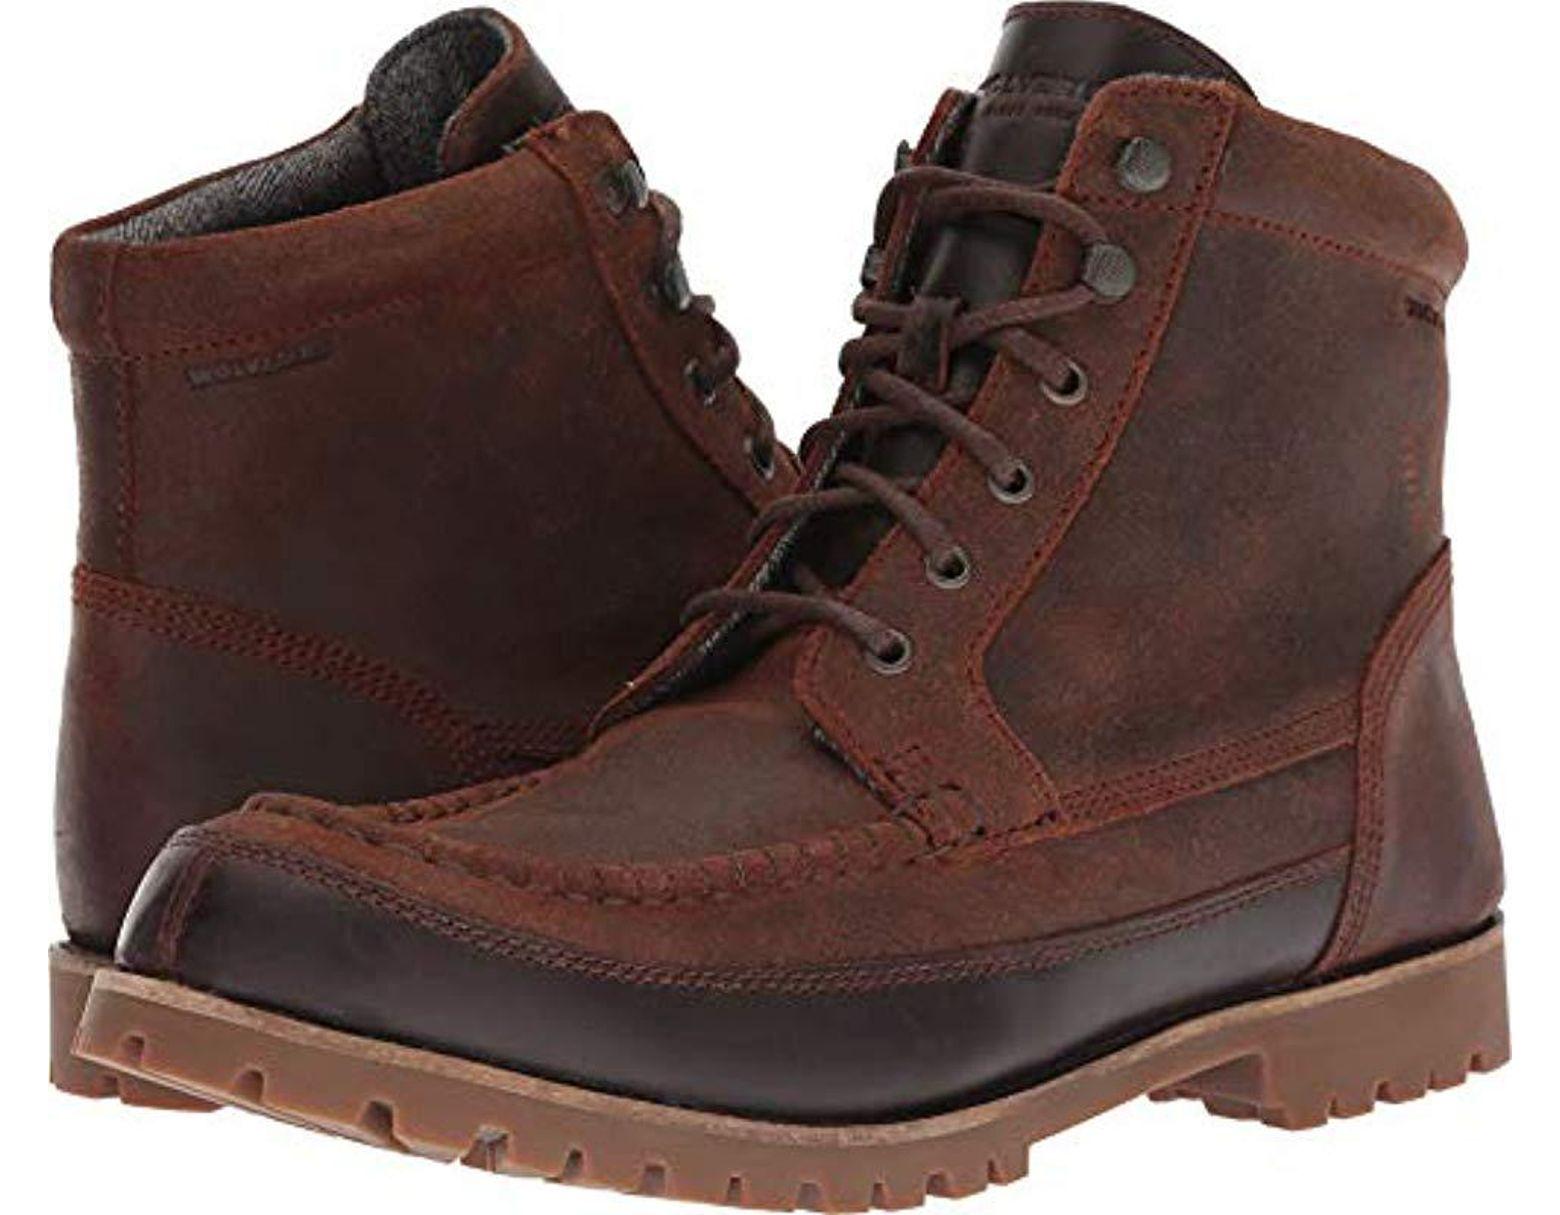 5b1240af6c4 Men's Brown Gainor 6